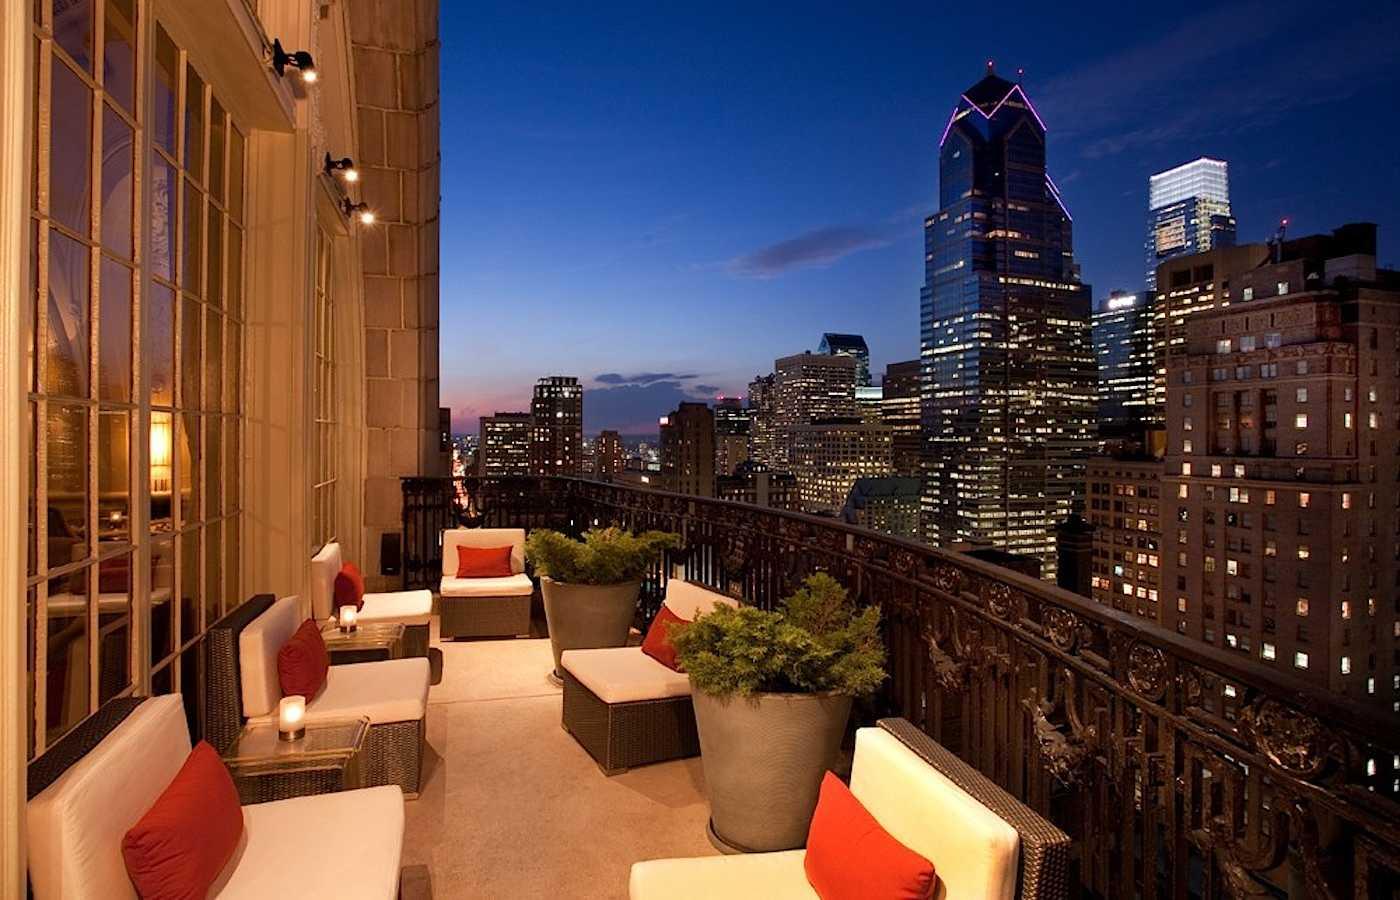 Best Bars in Philadelphia - Philly Nightlife